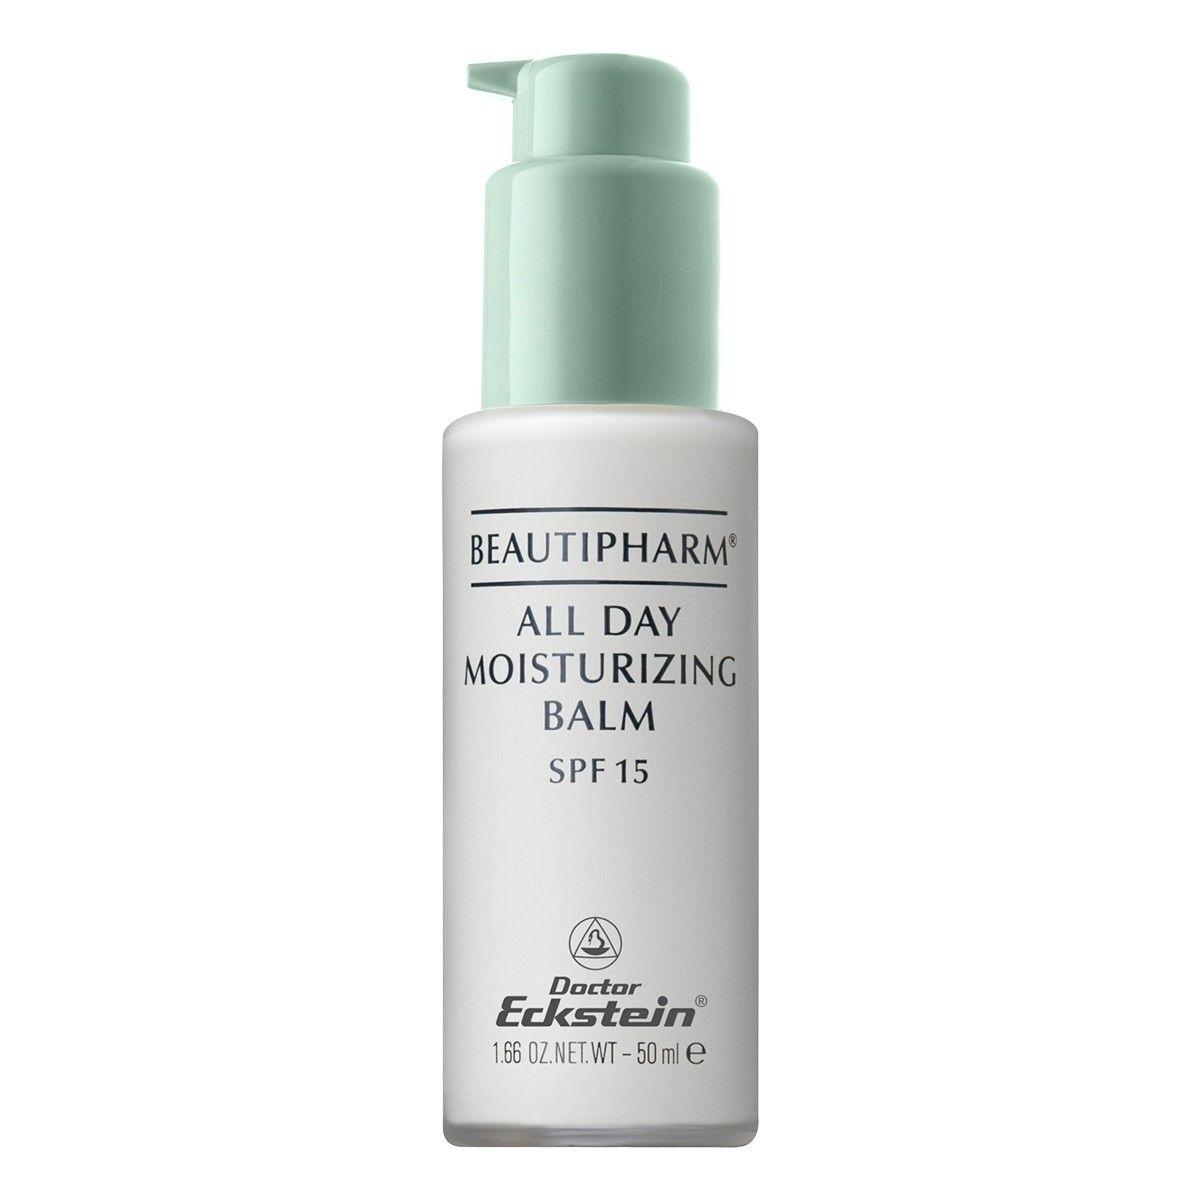 Afbeelding van Dr. Eckstein Beautipharm All Day Moisturizing Balm SPF 15 Crème Beauty